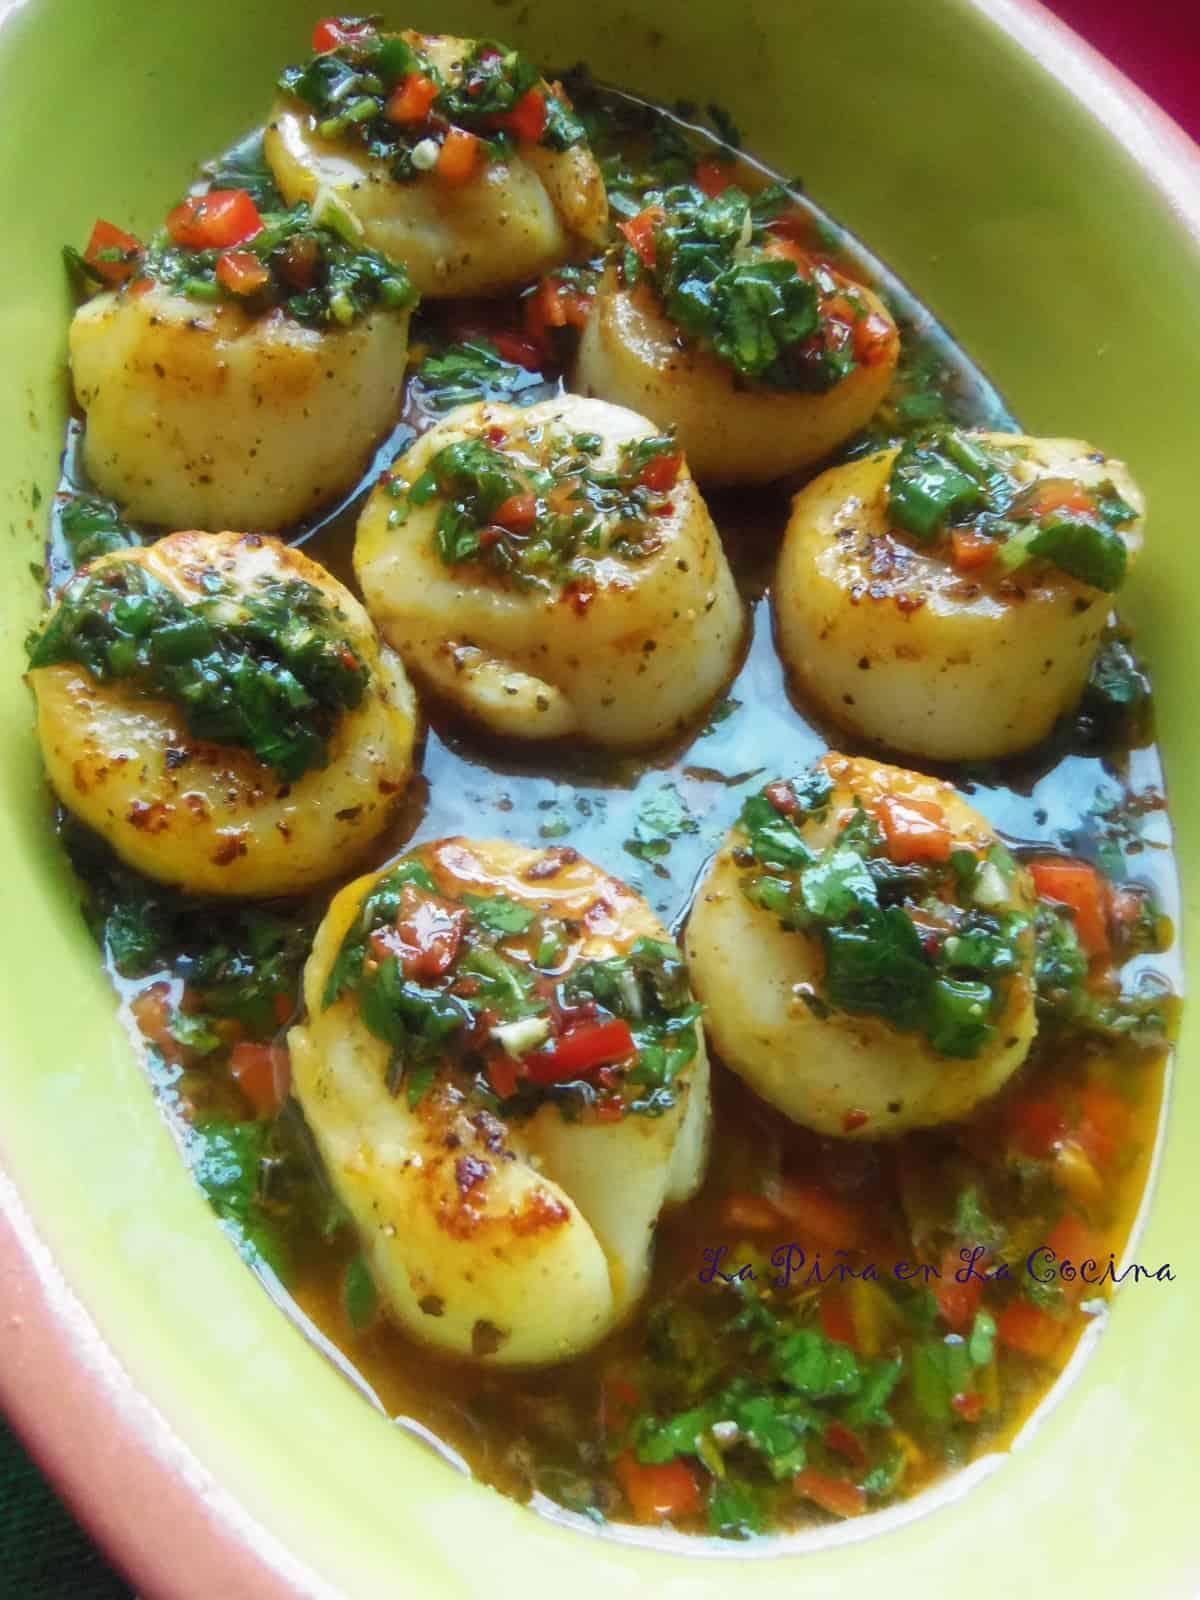 Seared Scallops in a Chimichurri Style Sauce